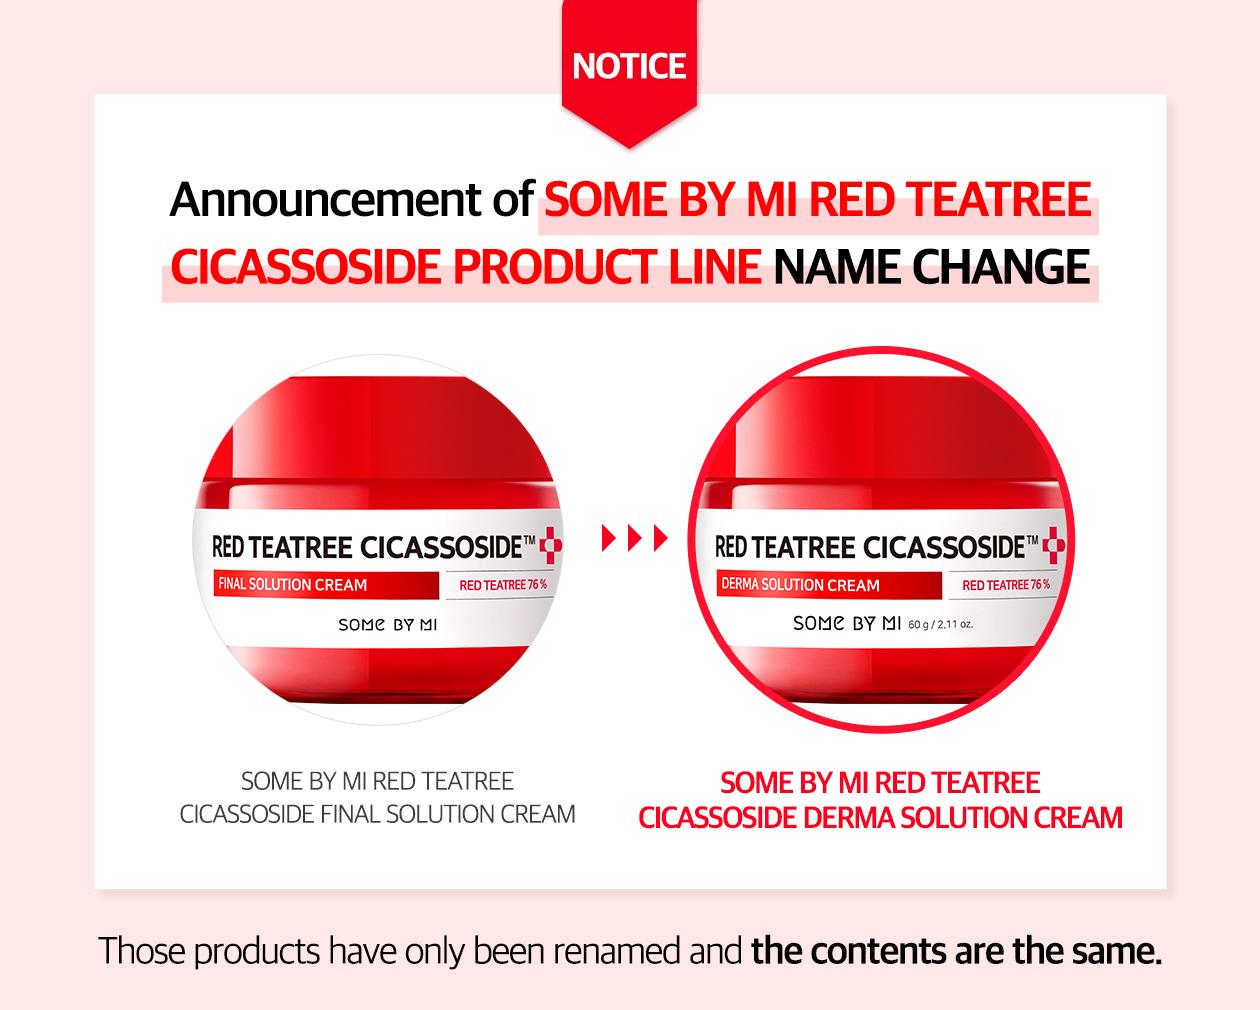 SOME BY MI - Red Teatree Cicassoside Derma Solution Cream - 60g